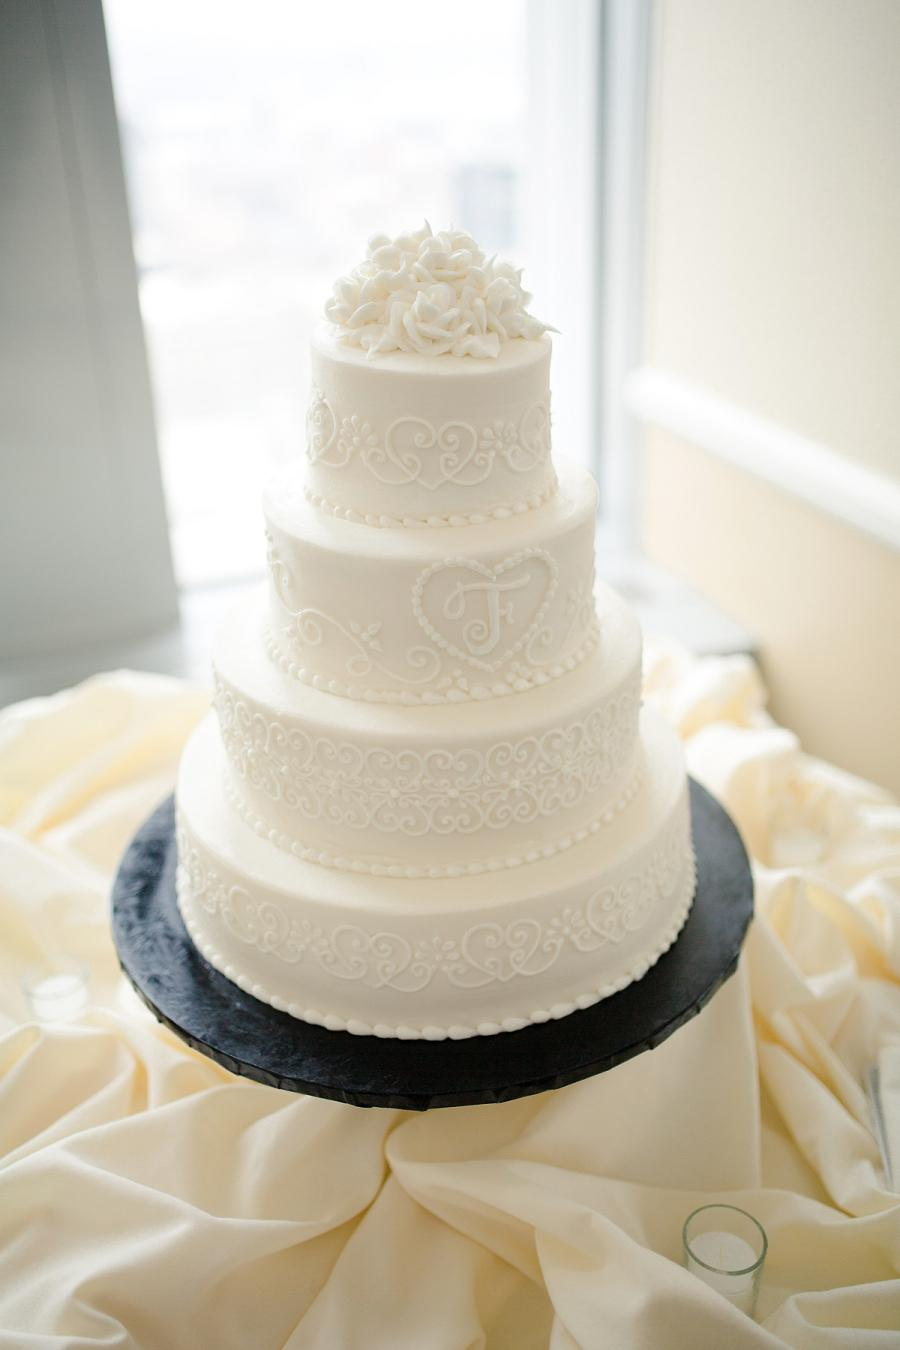 Pyramid-Club-Philadelphia-Wedding-by-Adrienne-Matz-Photography_0089d